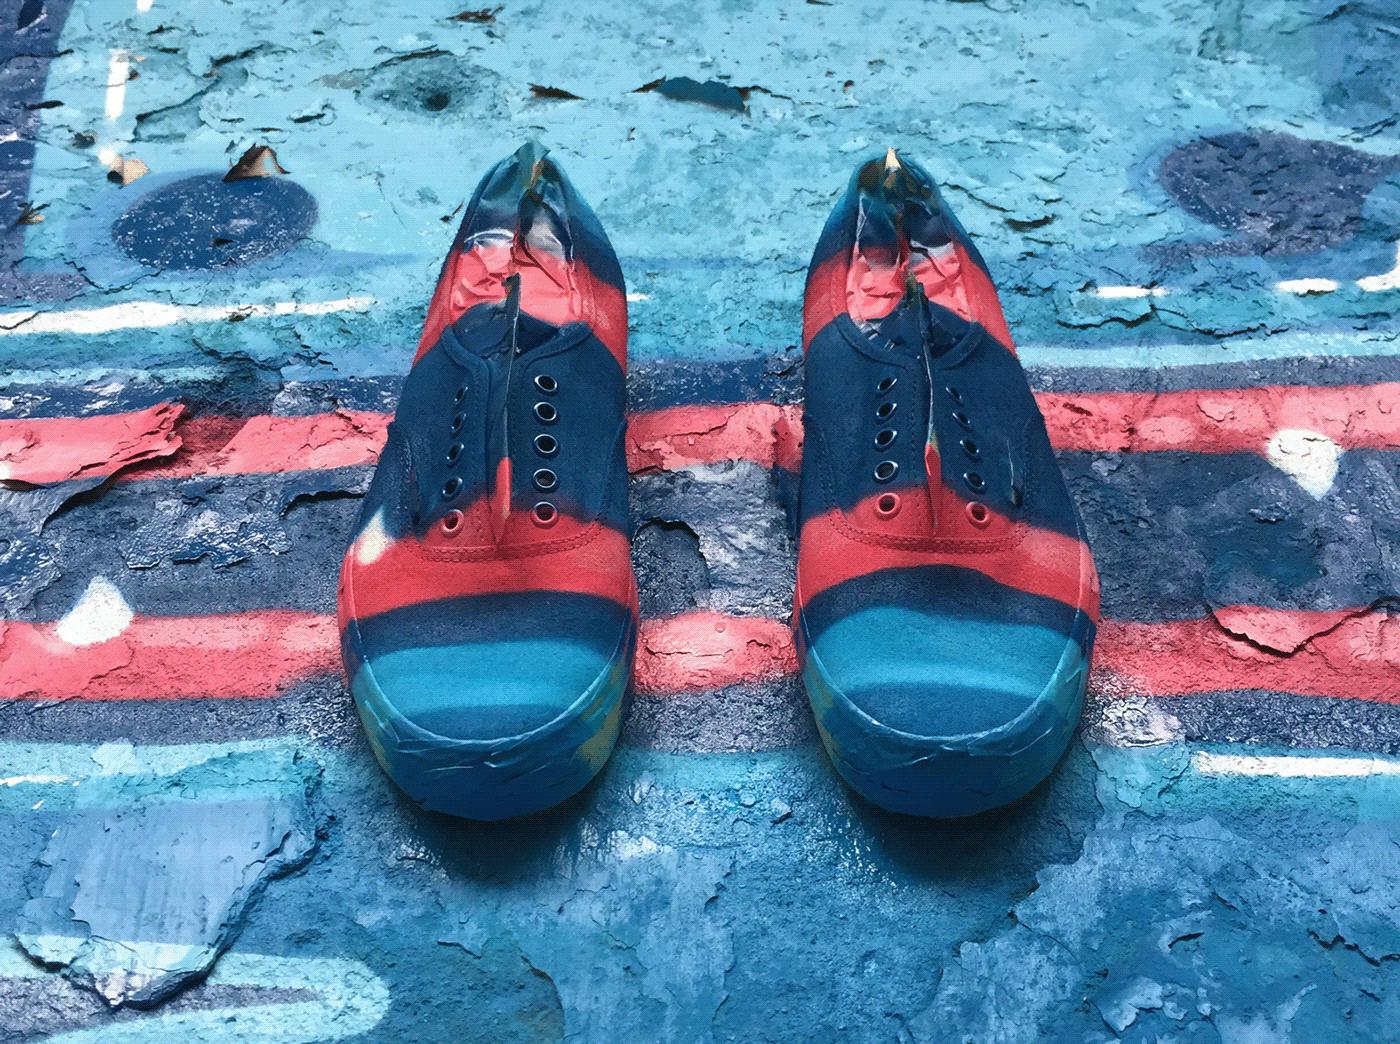 custom shoes Fashion  haribo Jelly Bears KIWIE Spray painting Street Art  street wear urban art Vans shoes